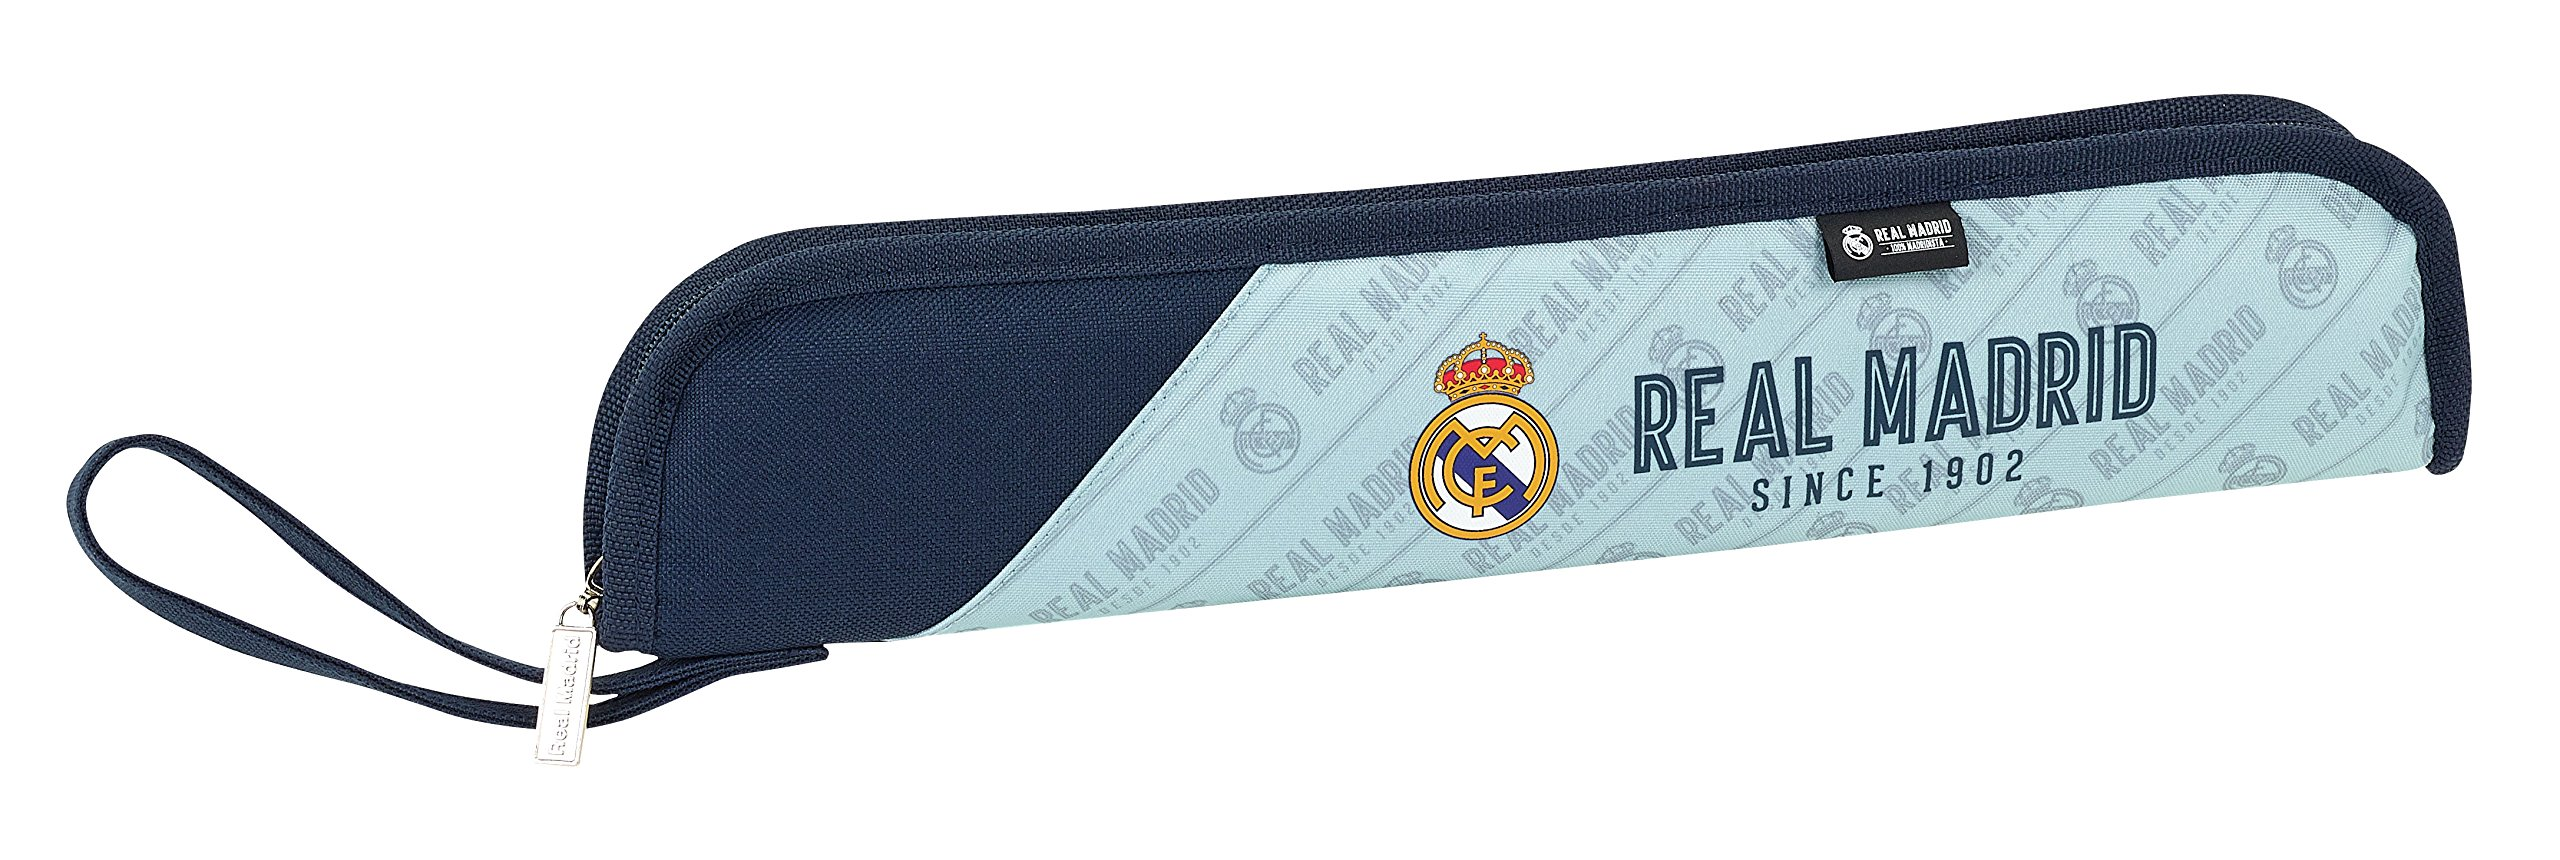 Safta Portaflautas Real Madrid Corporativa Oficial Protector Flauta 370x20x80mm